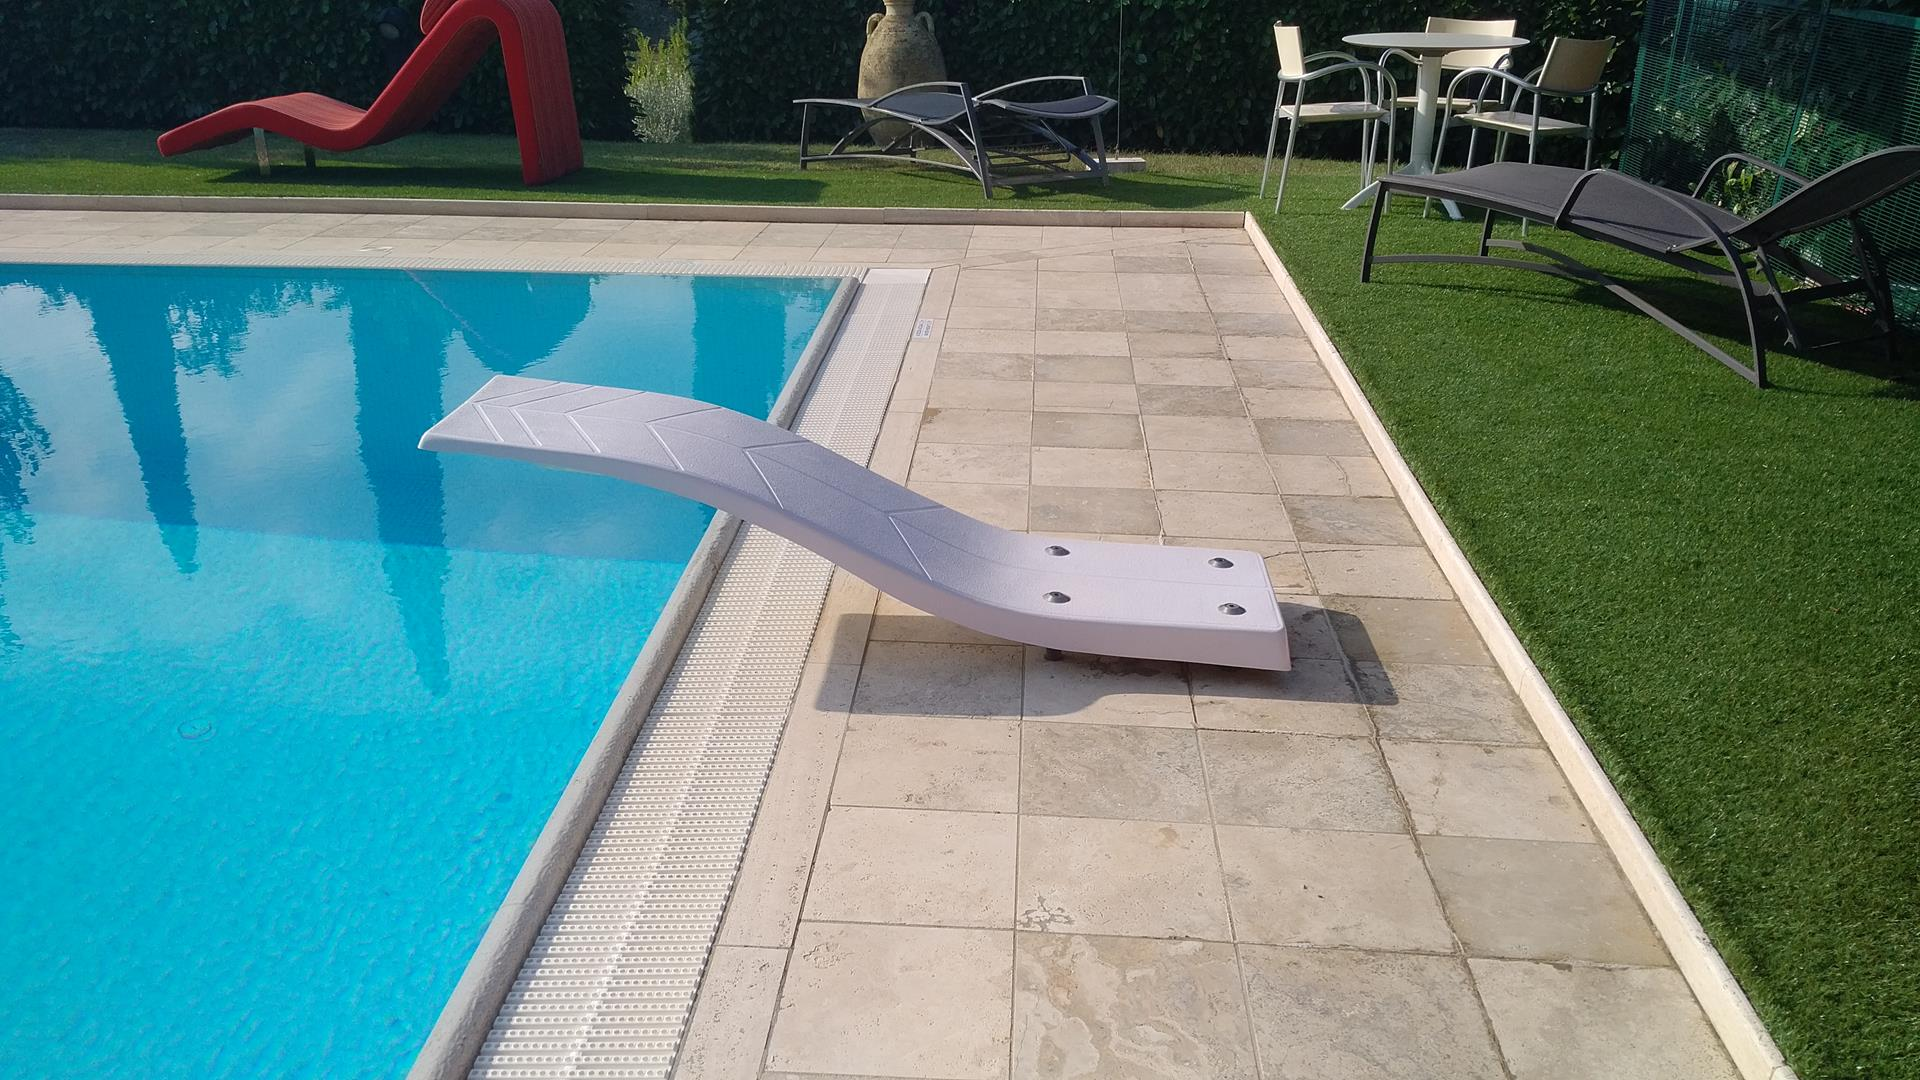 trampolini-per-piscine-1